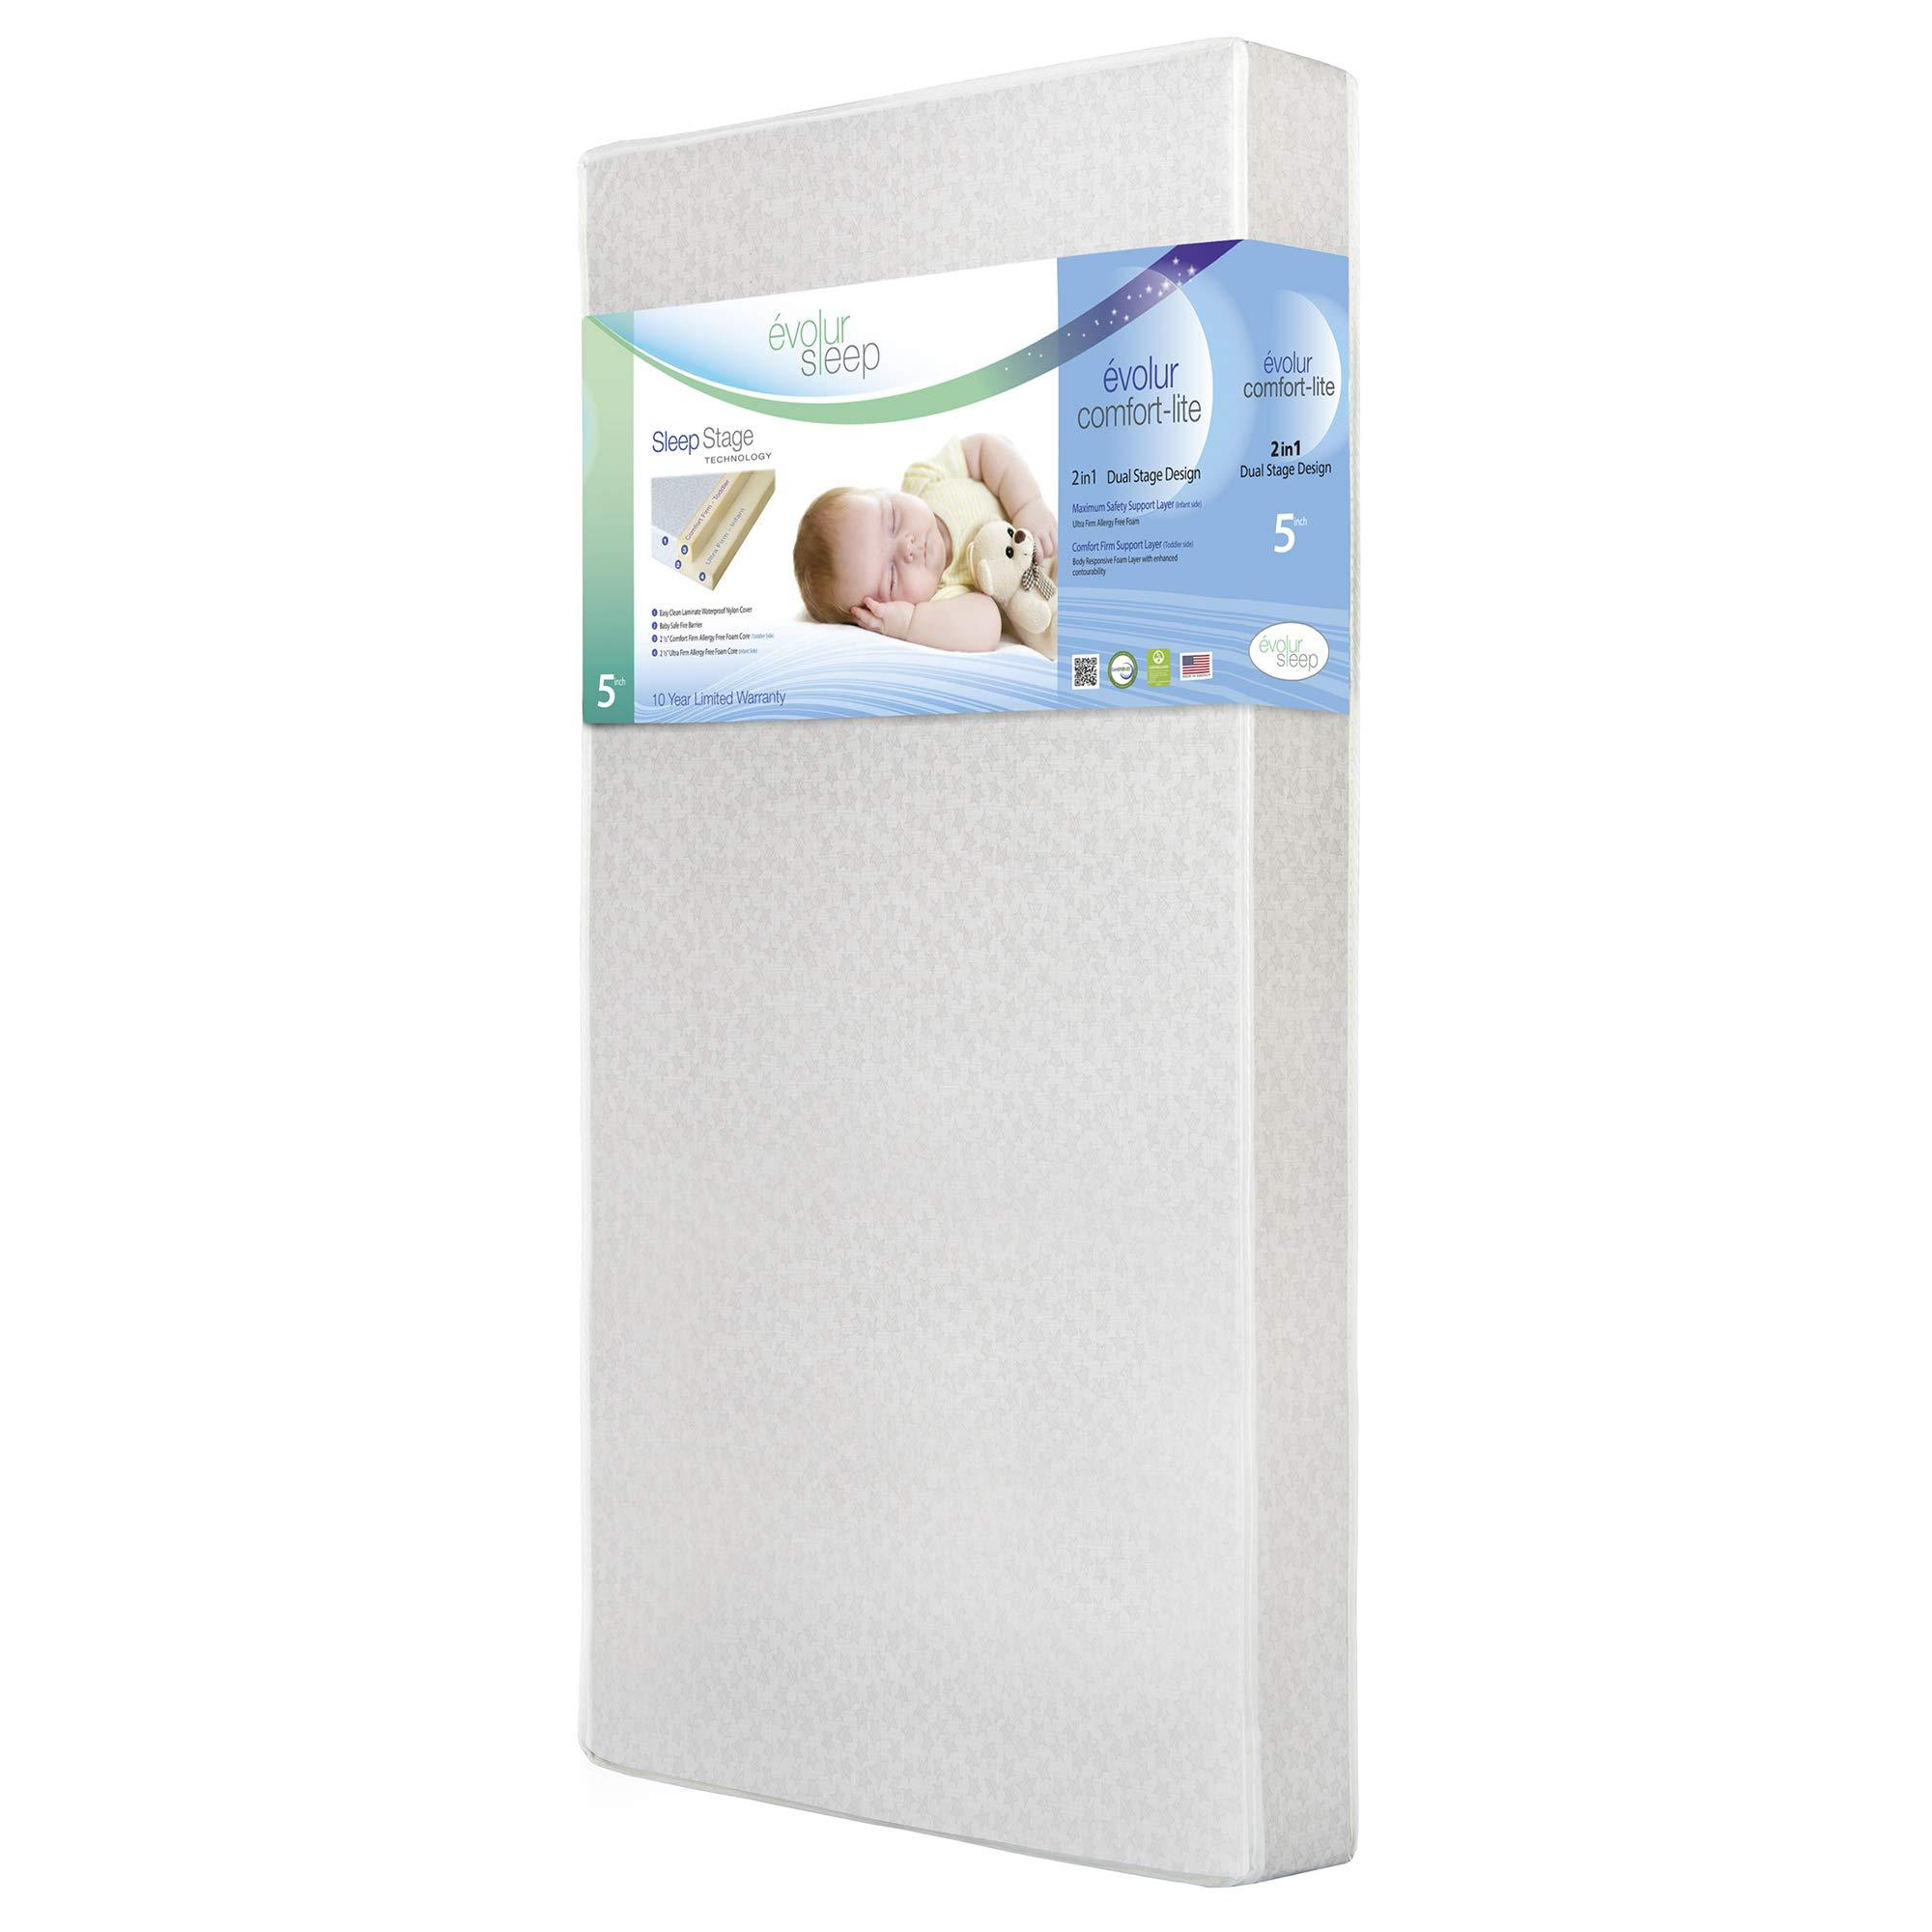 Evolur Sleep Dual Stage Comfort-Lite Foam Mattress, Silver Star, 5'' by Evolur